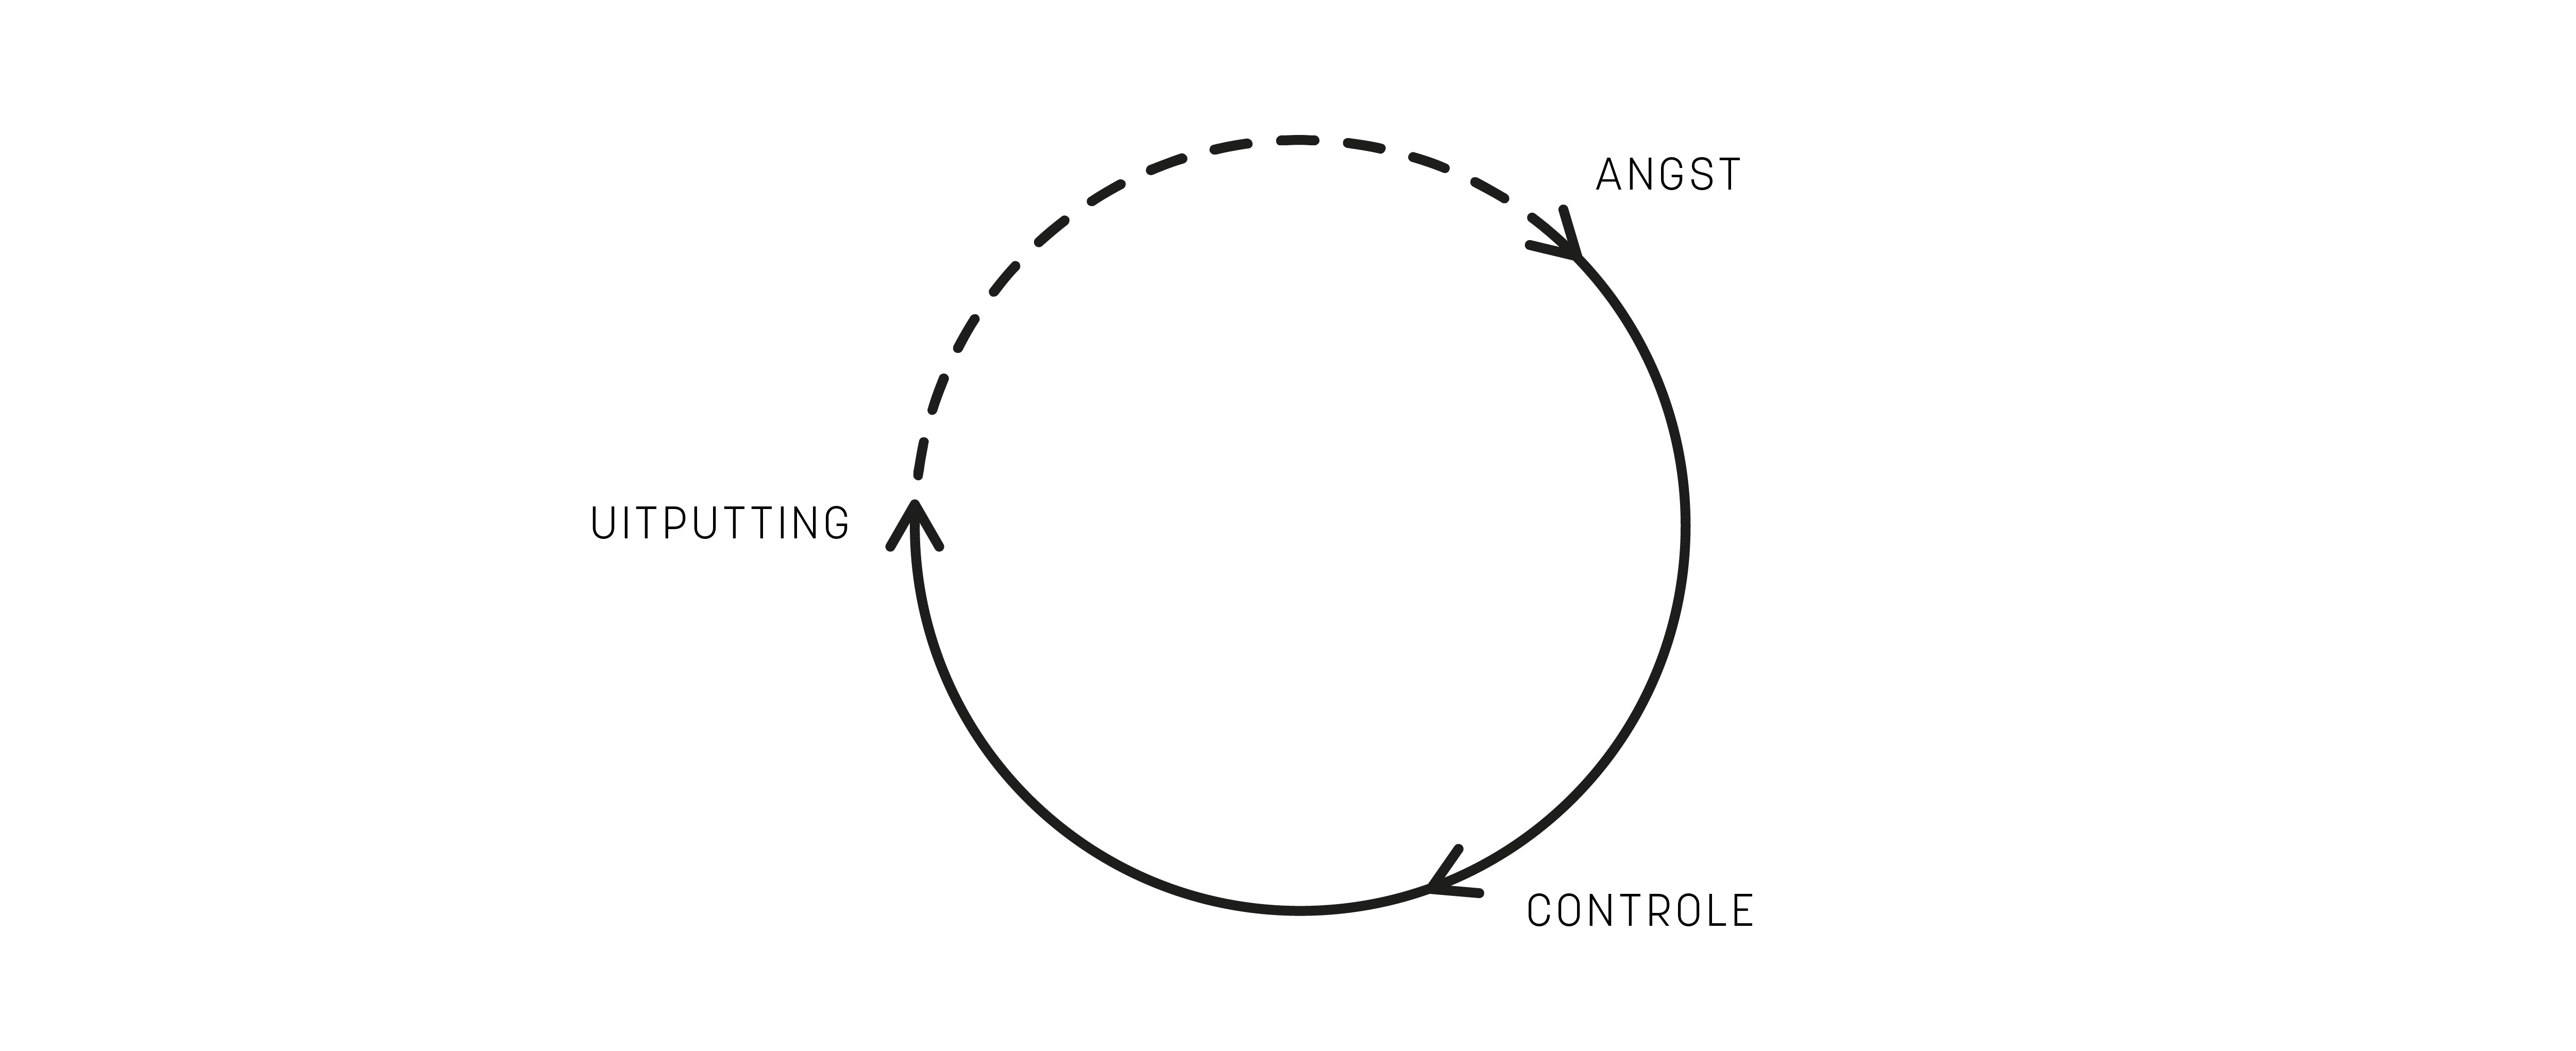 De vicieuze cirkel van perfectionisme